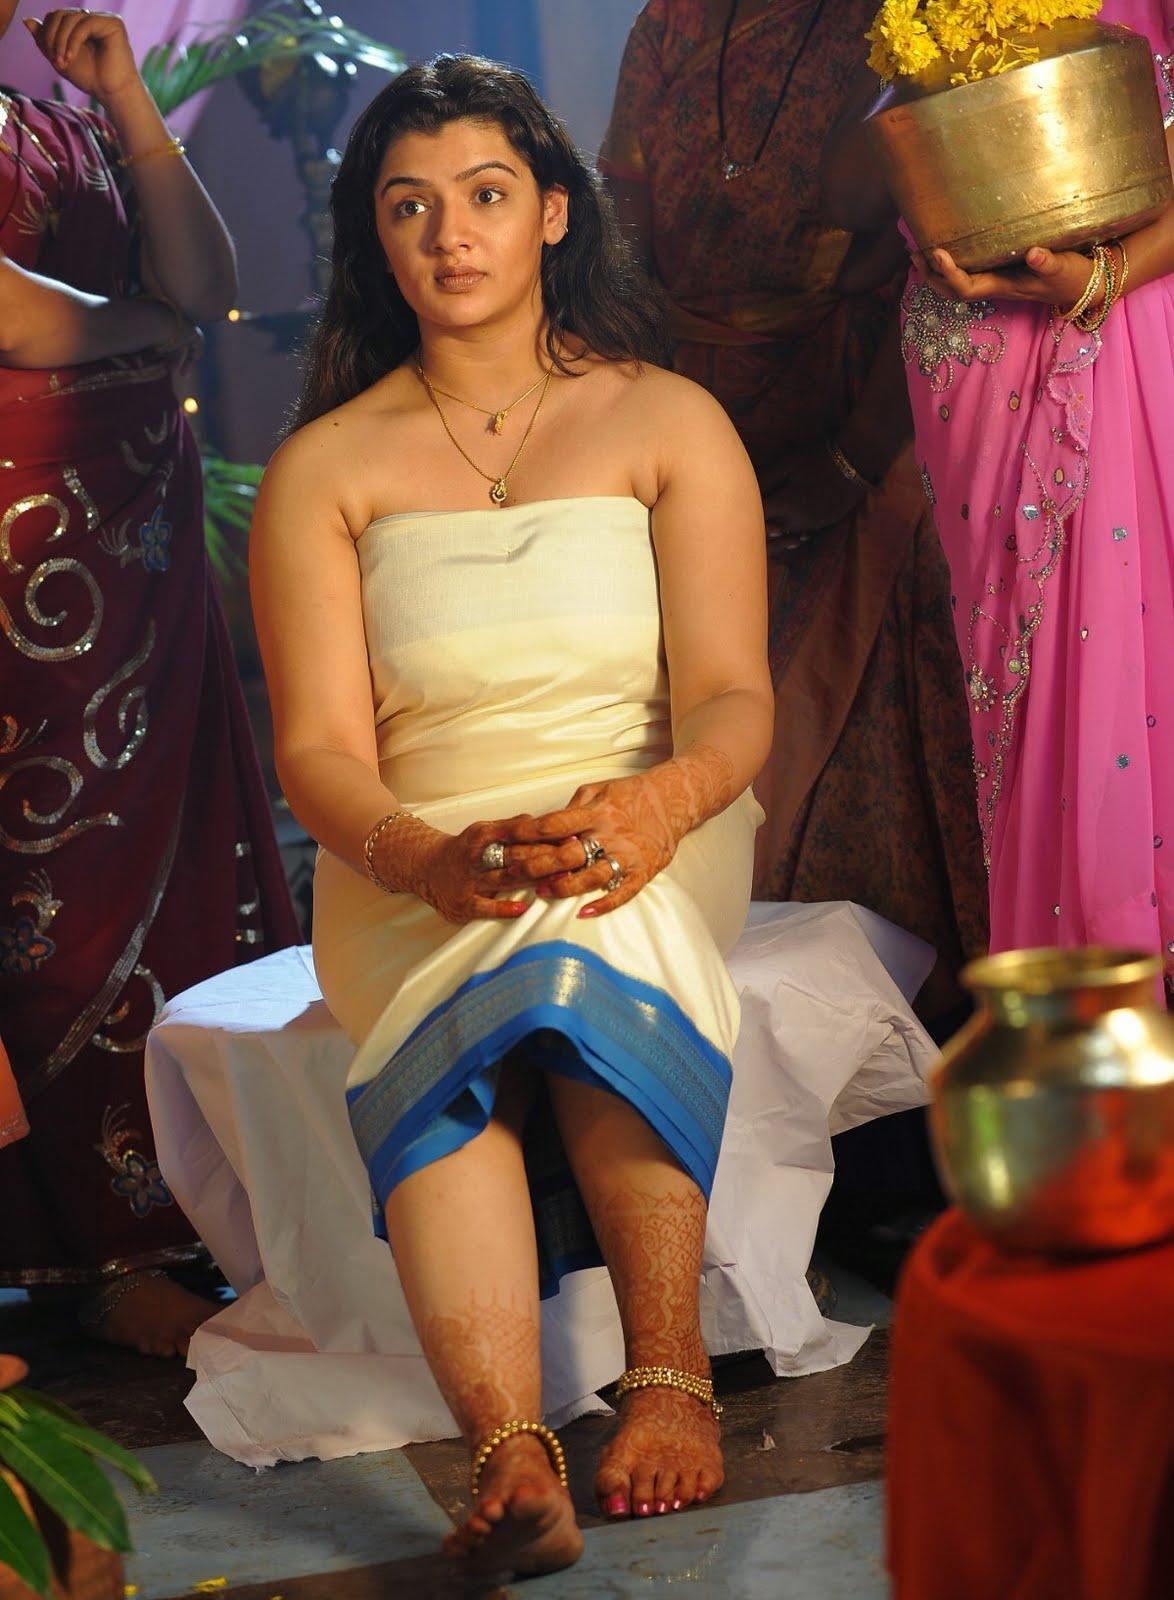 ankita shorey latest photos 4 image gallery ankita shorey cinema